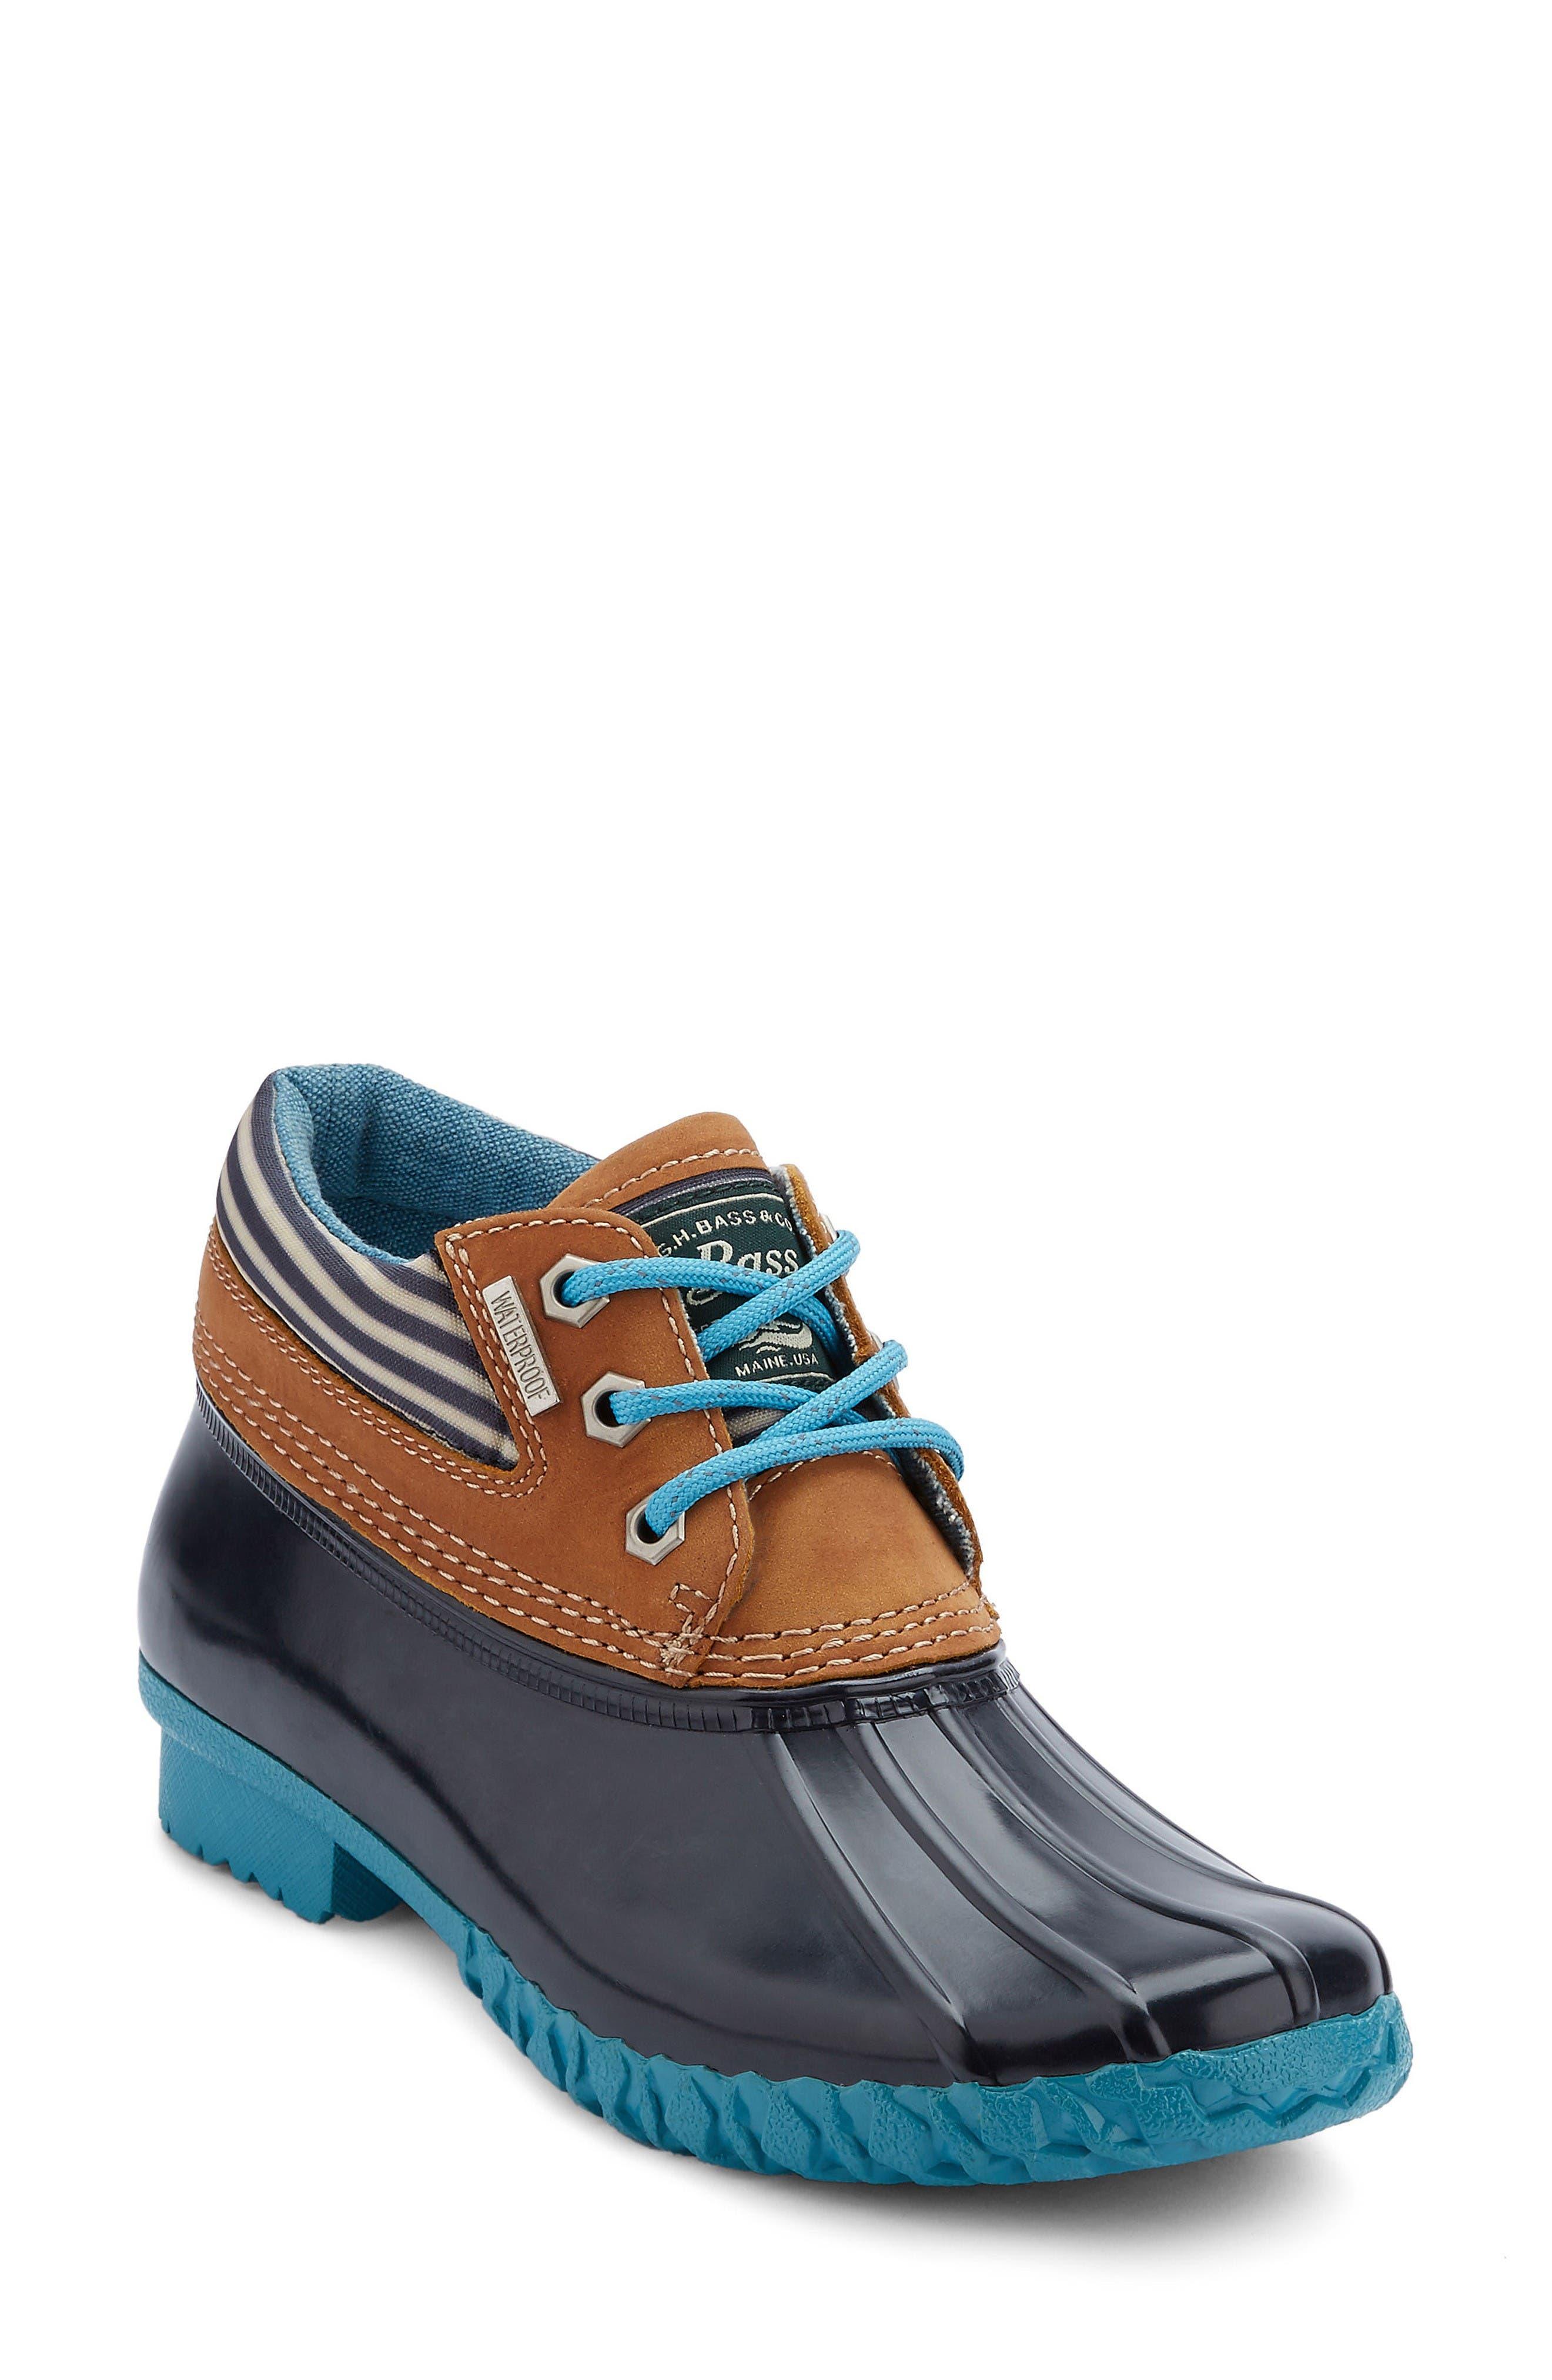 G.H. BASS & CO. Dorothy Waterproof Duck Boot